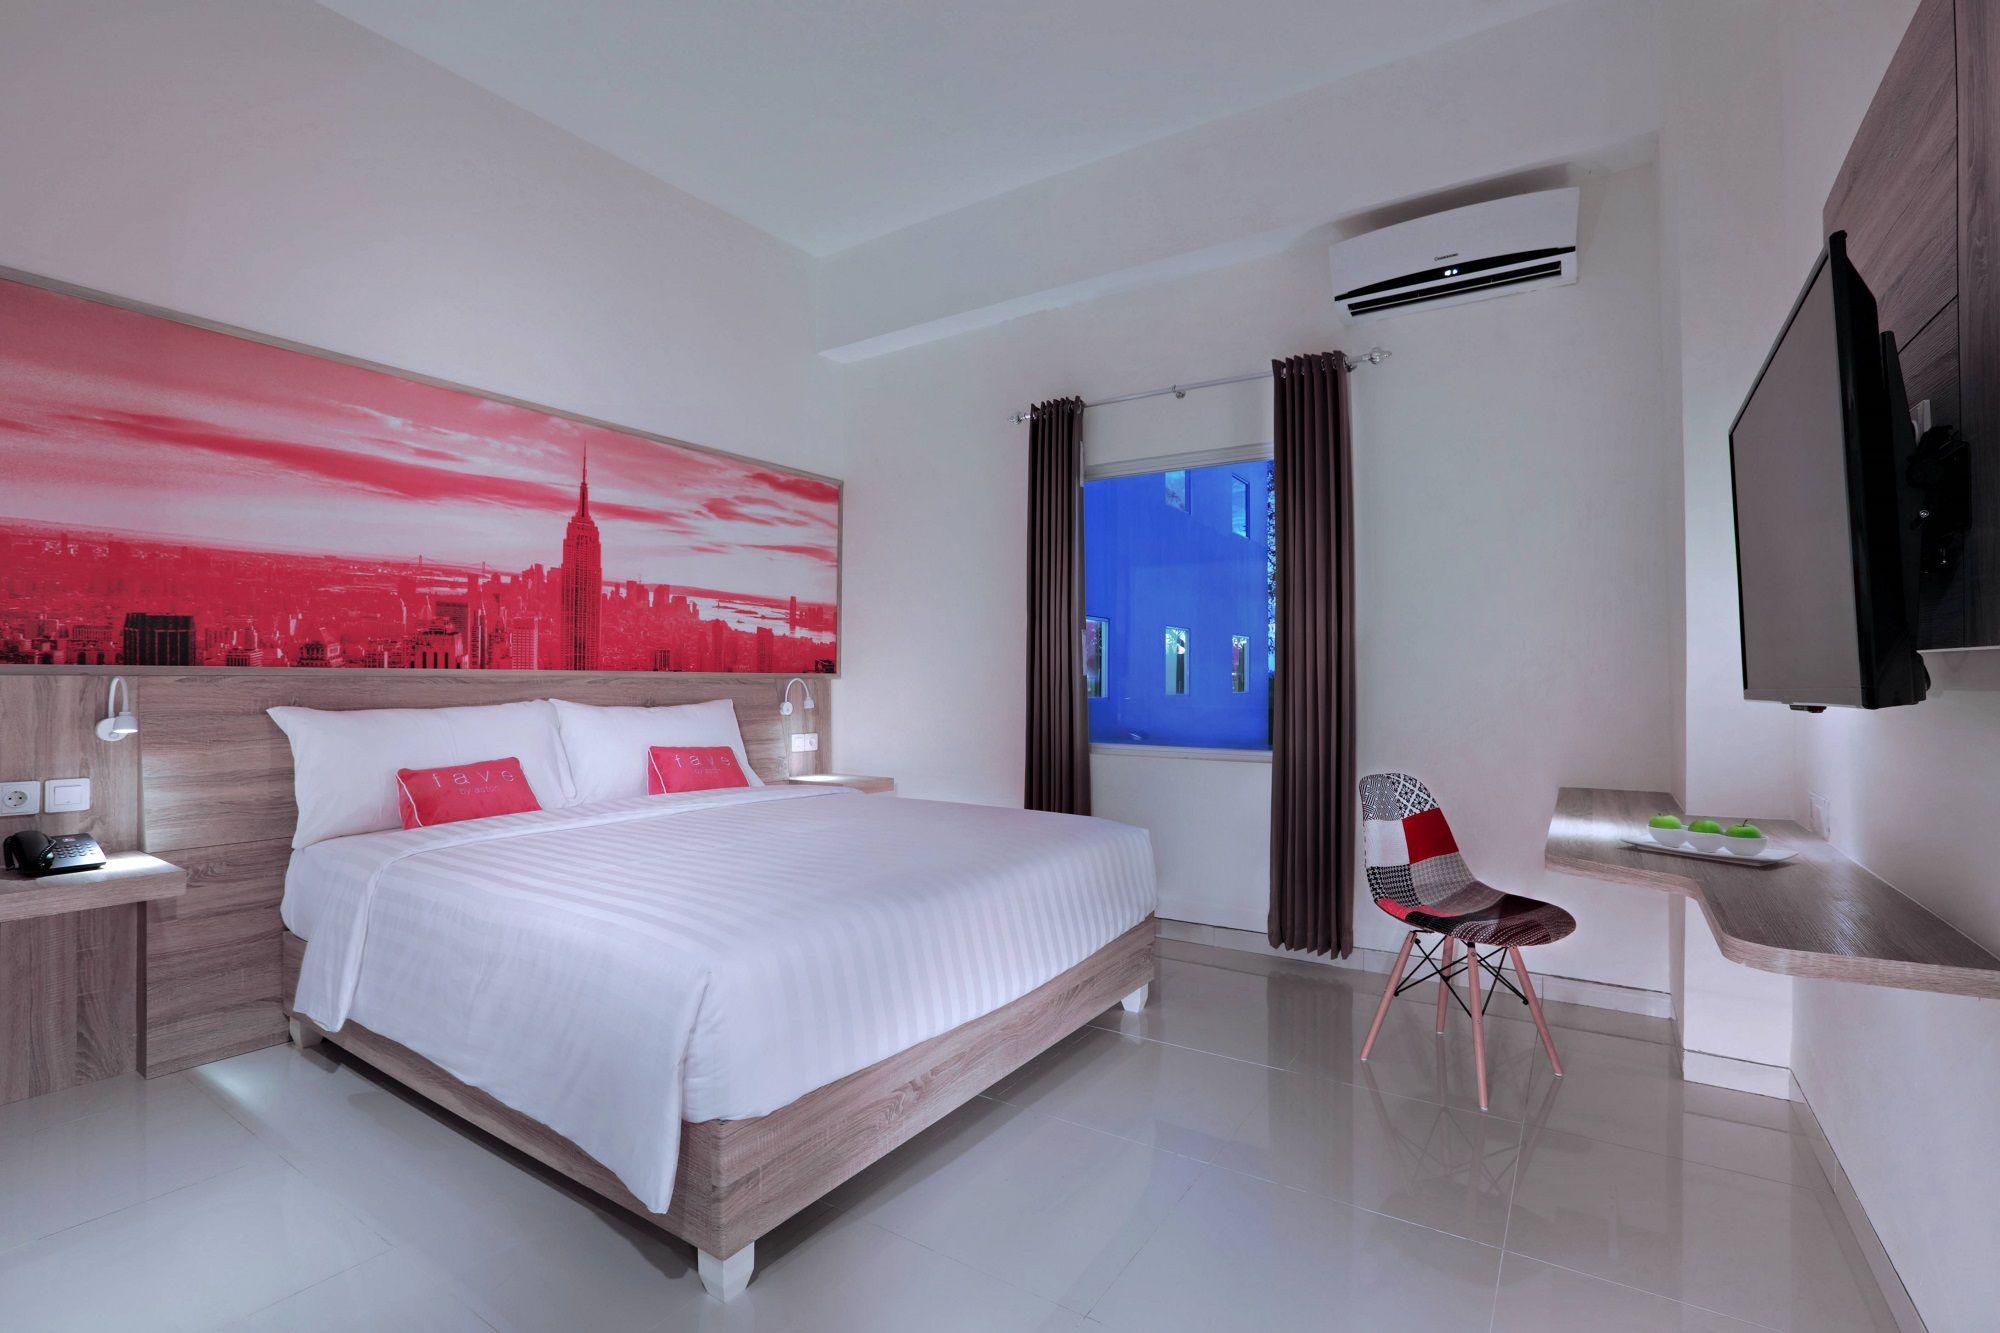 favehotel Banjarbaru - Banjarmasin, Banjarbaru